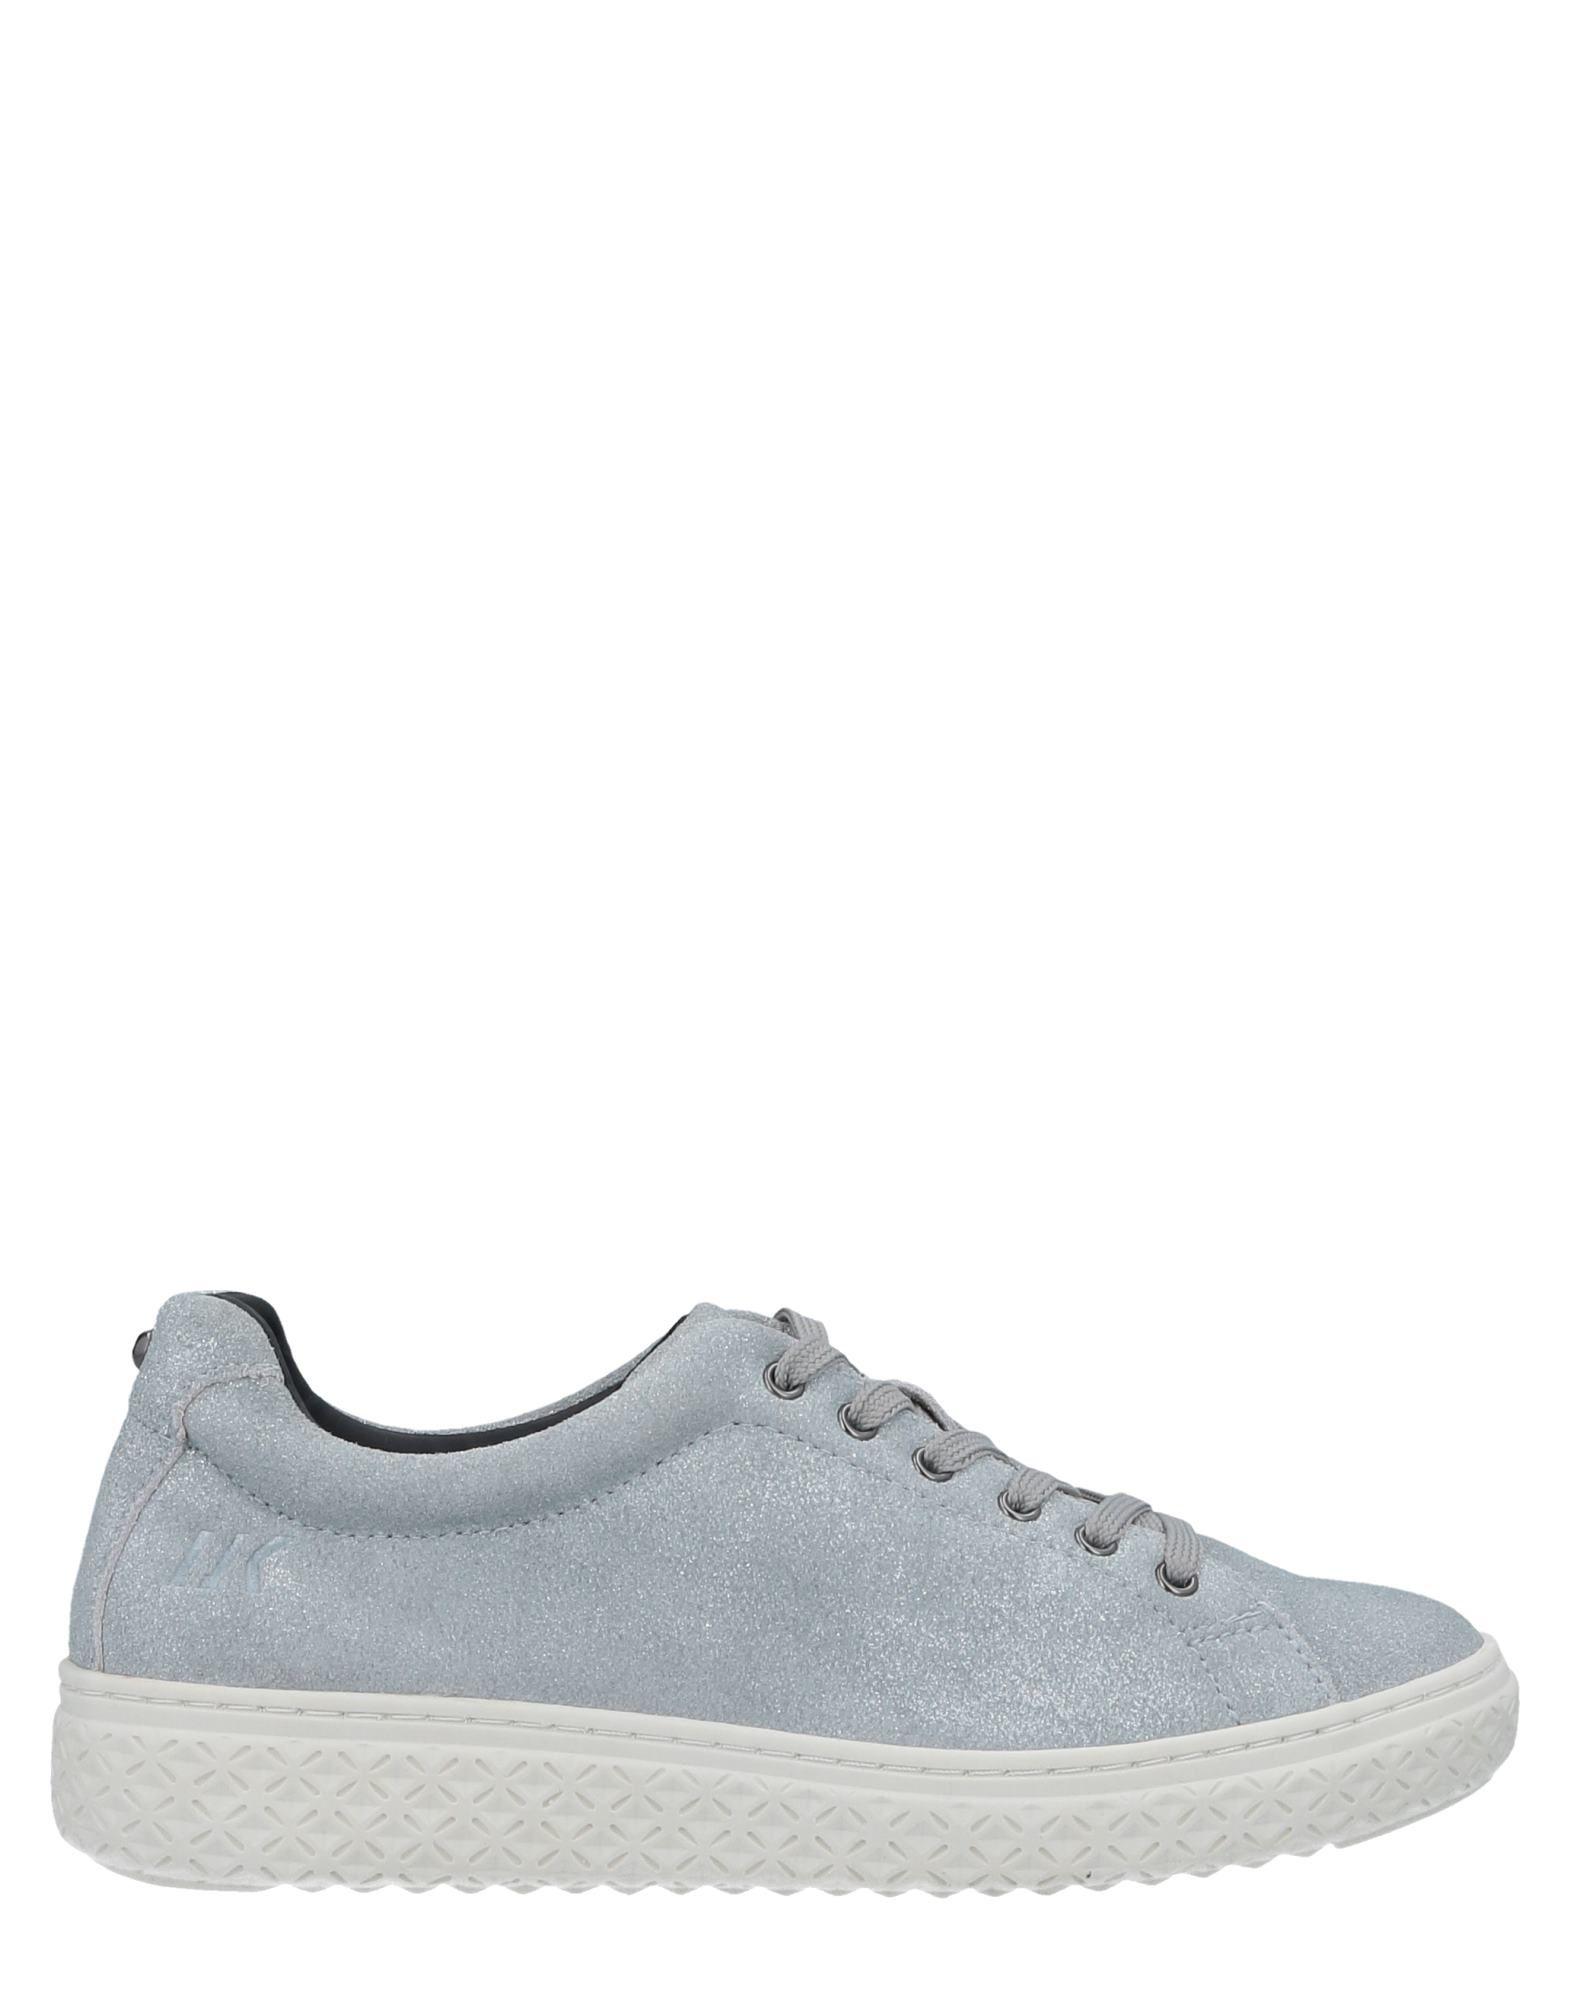 Lumberjack Sneakers Damen  11514488WI Gute Qualität beliebte Schuhe